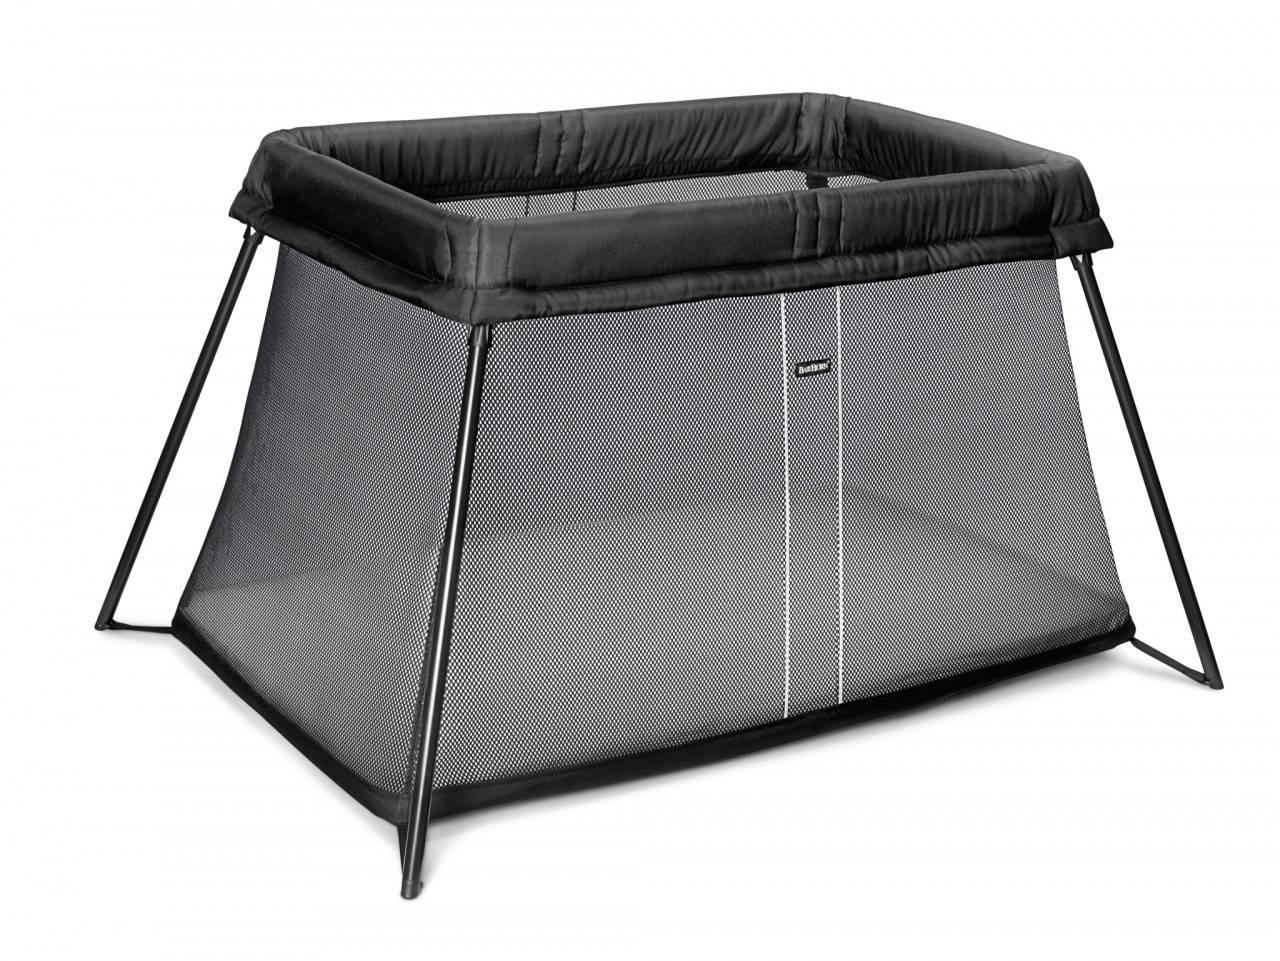 baby bjorn babybjorn travel cot light black mesh ebay. Black Bedroom Furniture Sets. Home Design Ideas